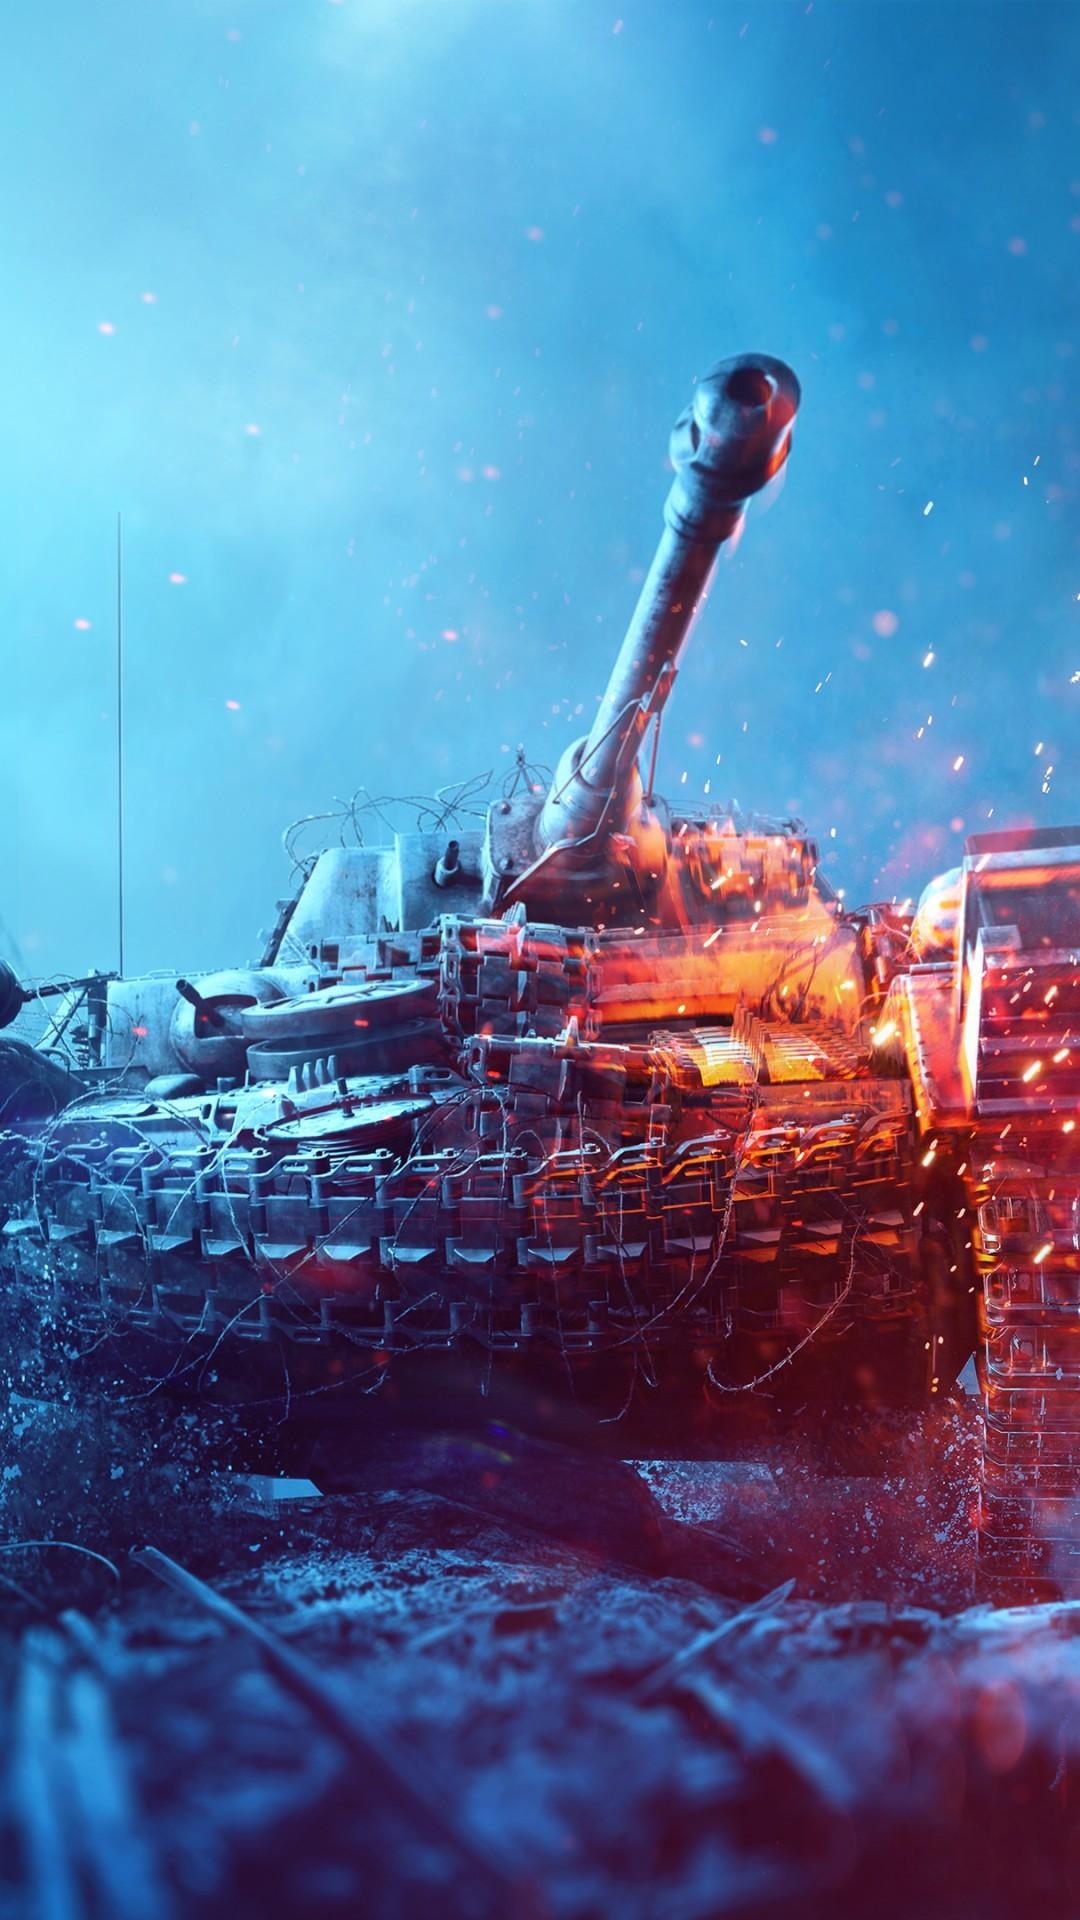 Free Battlefield V Gamescom phone wallpaper by edwardsdavid_22